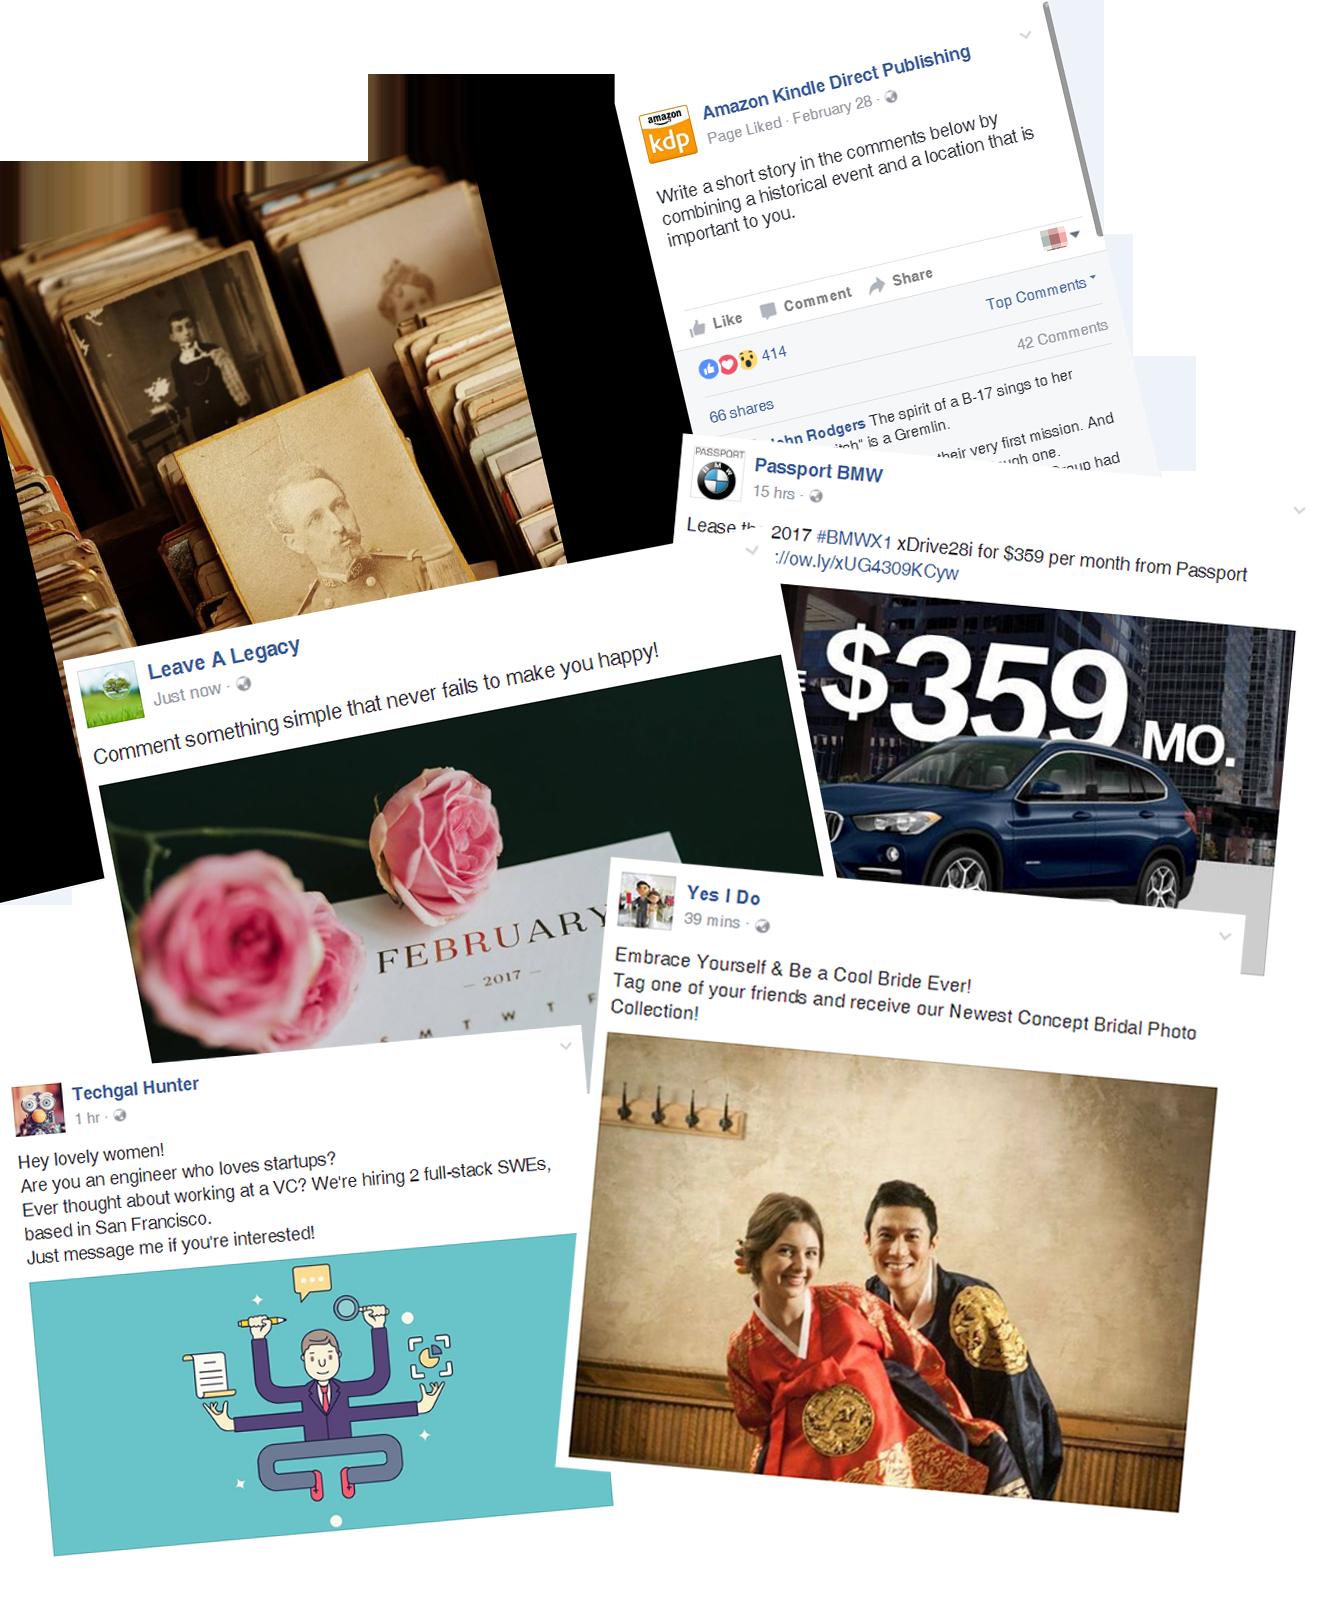 Messenger AutoReply sample posts